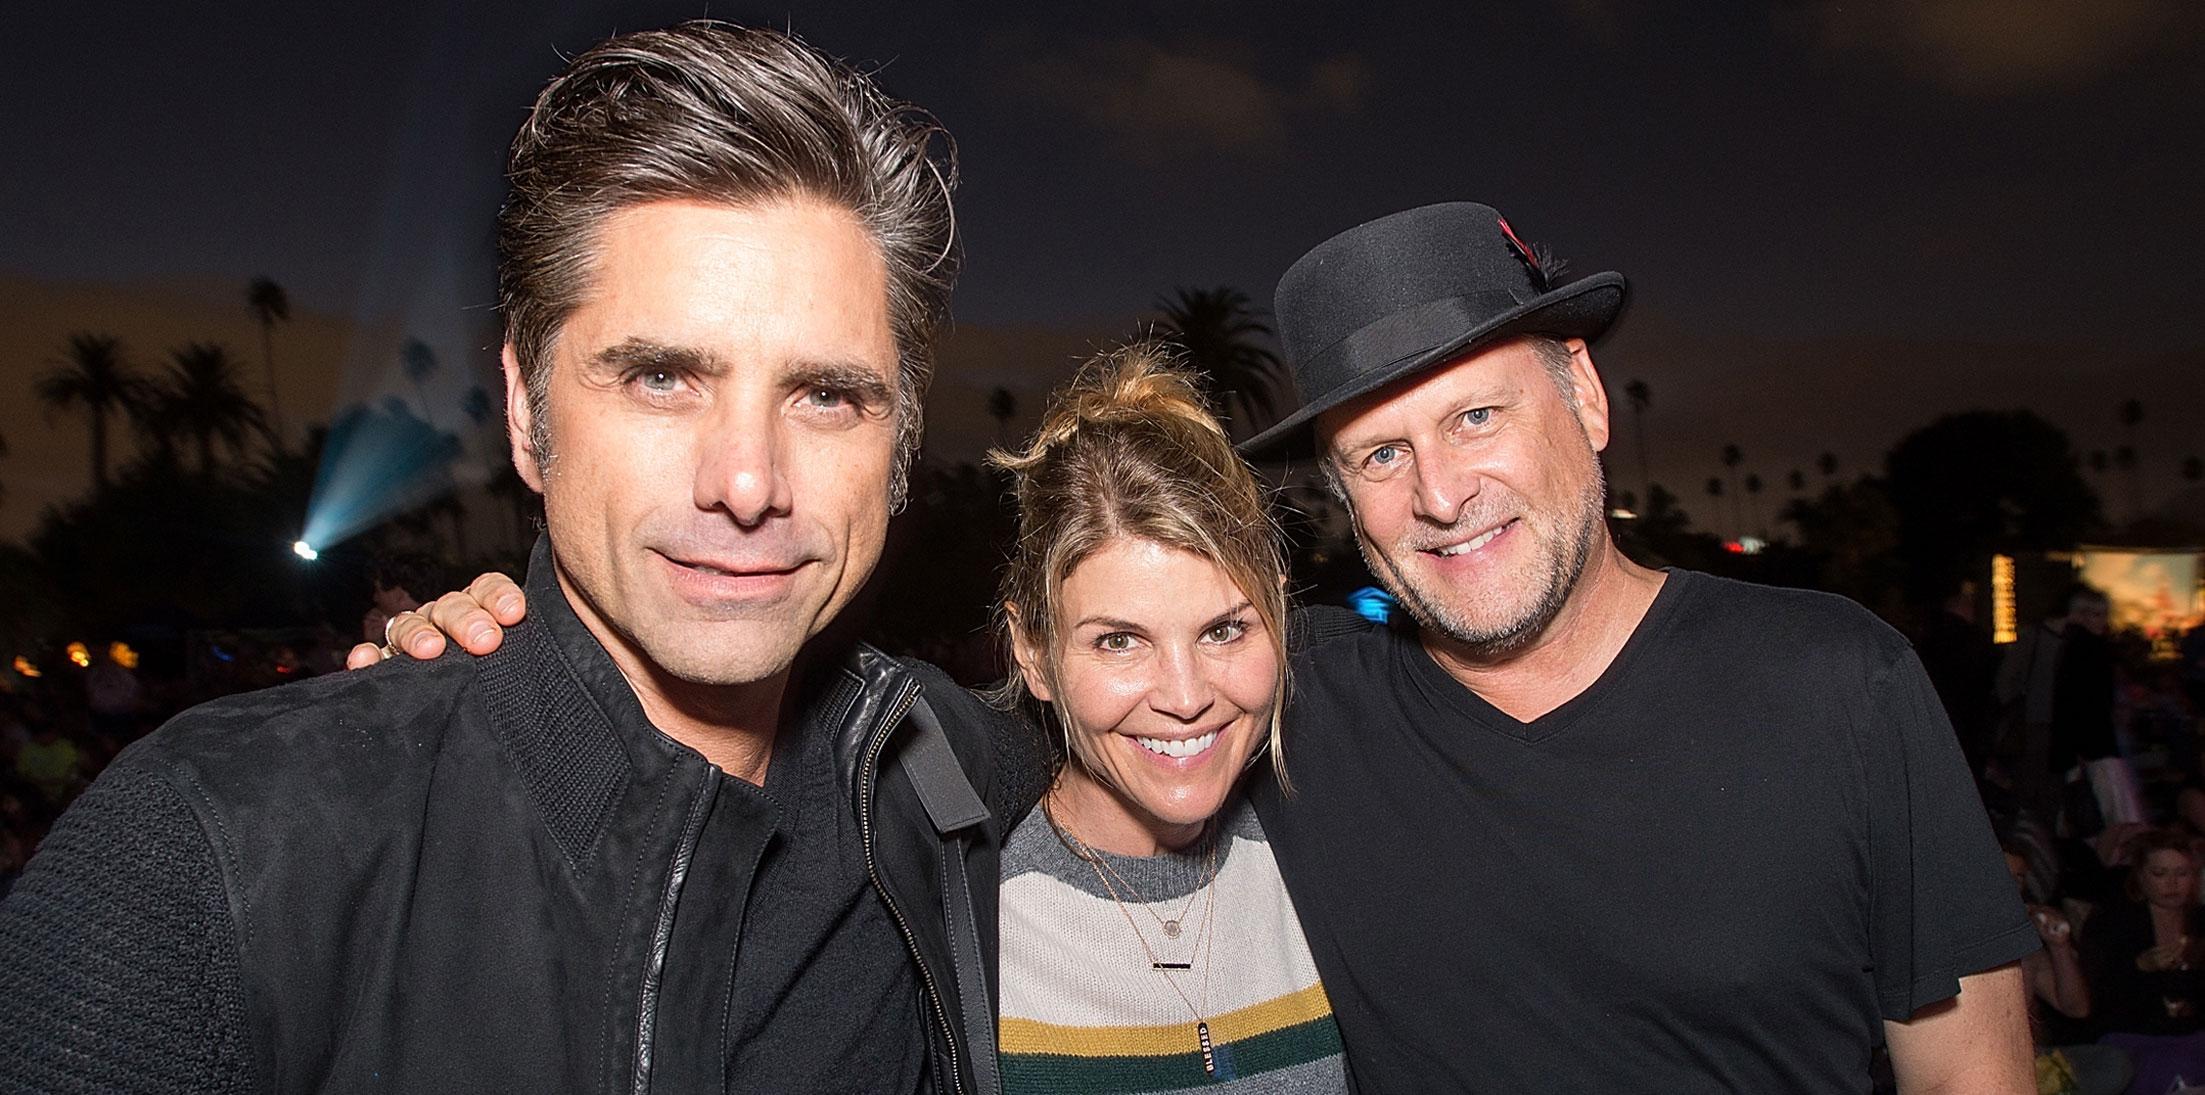 John Stamos Birthday Full House Reunion Pics Long